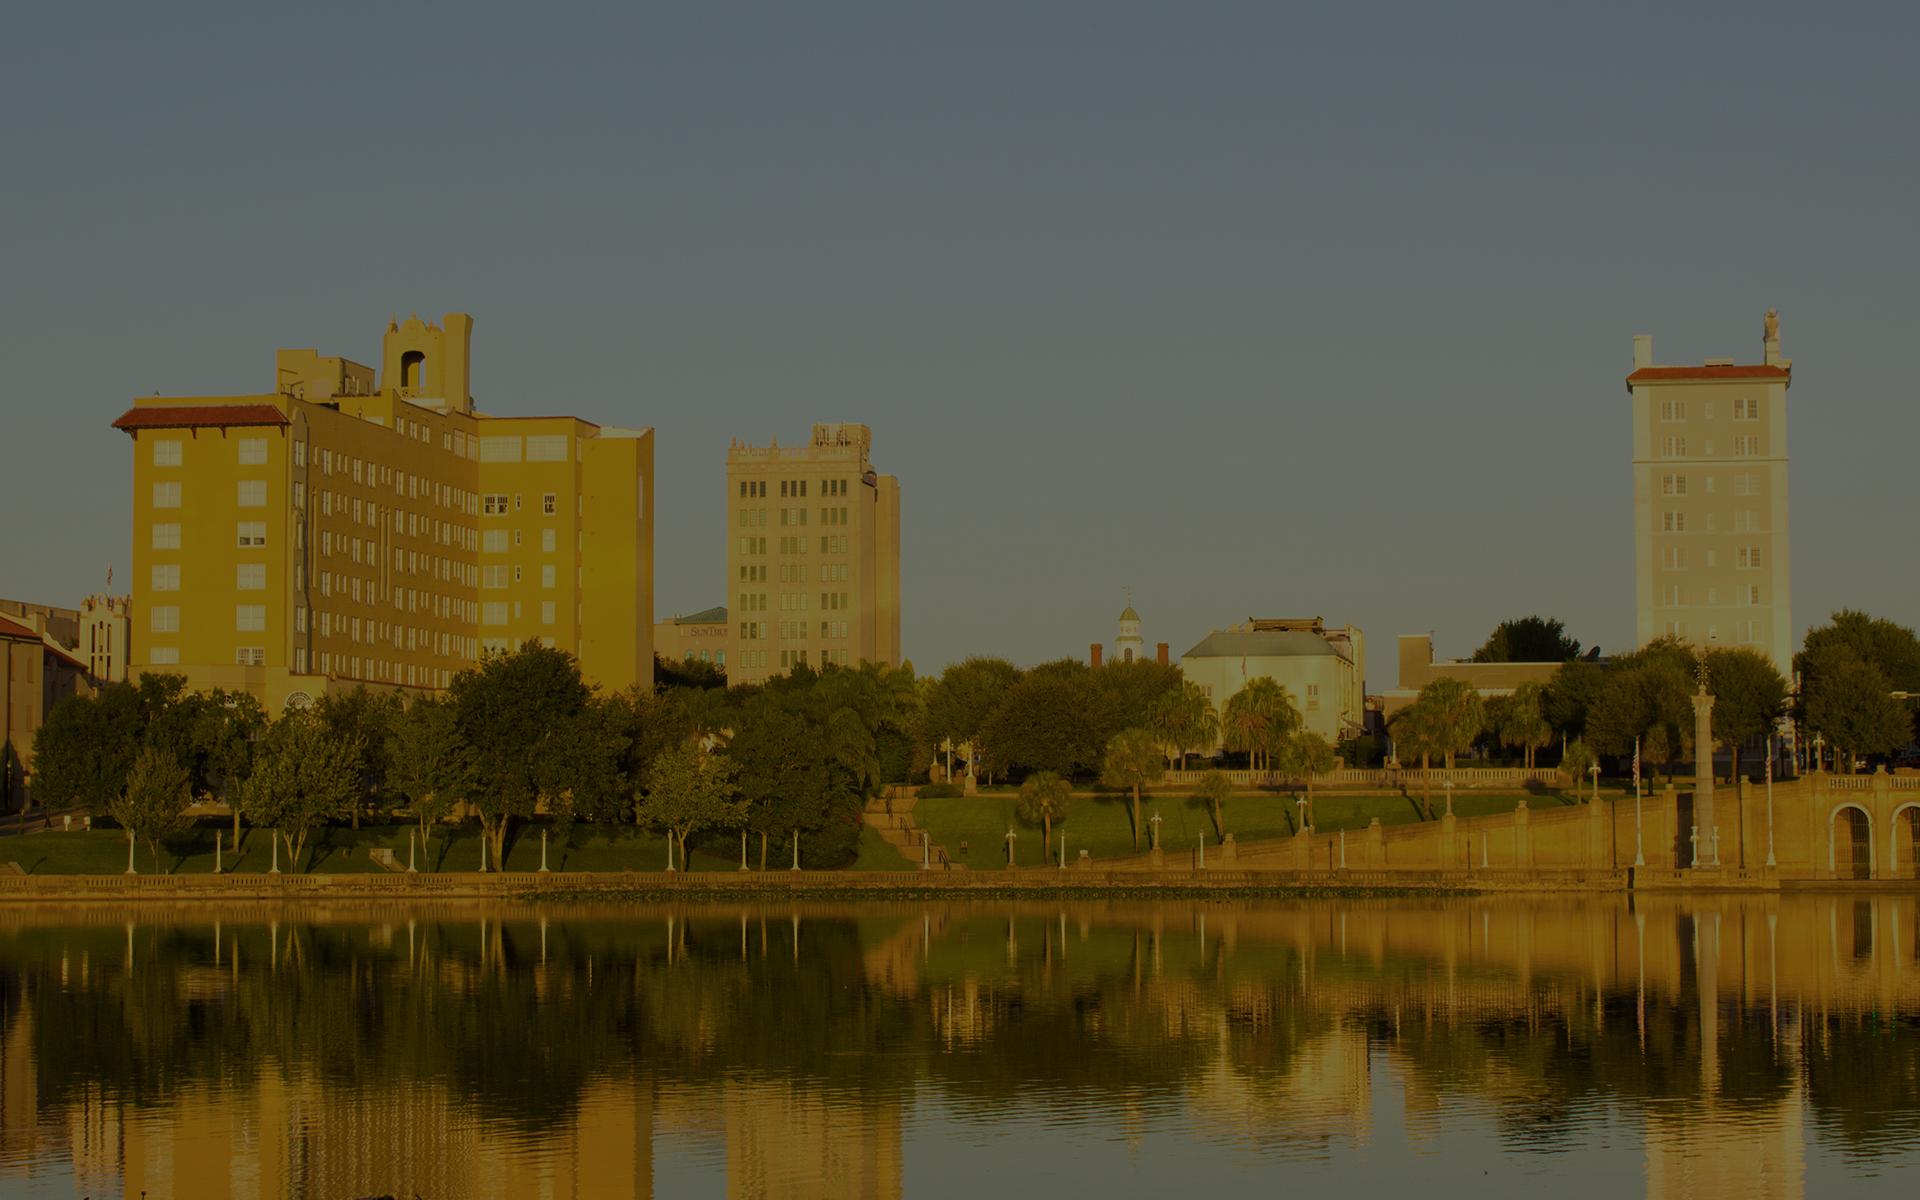 Downtown<br>Lakeland, Florida